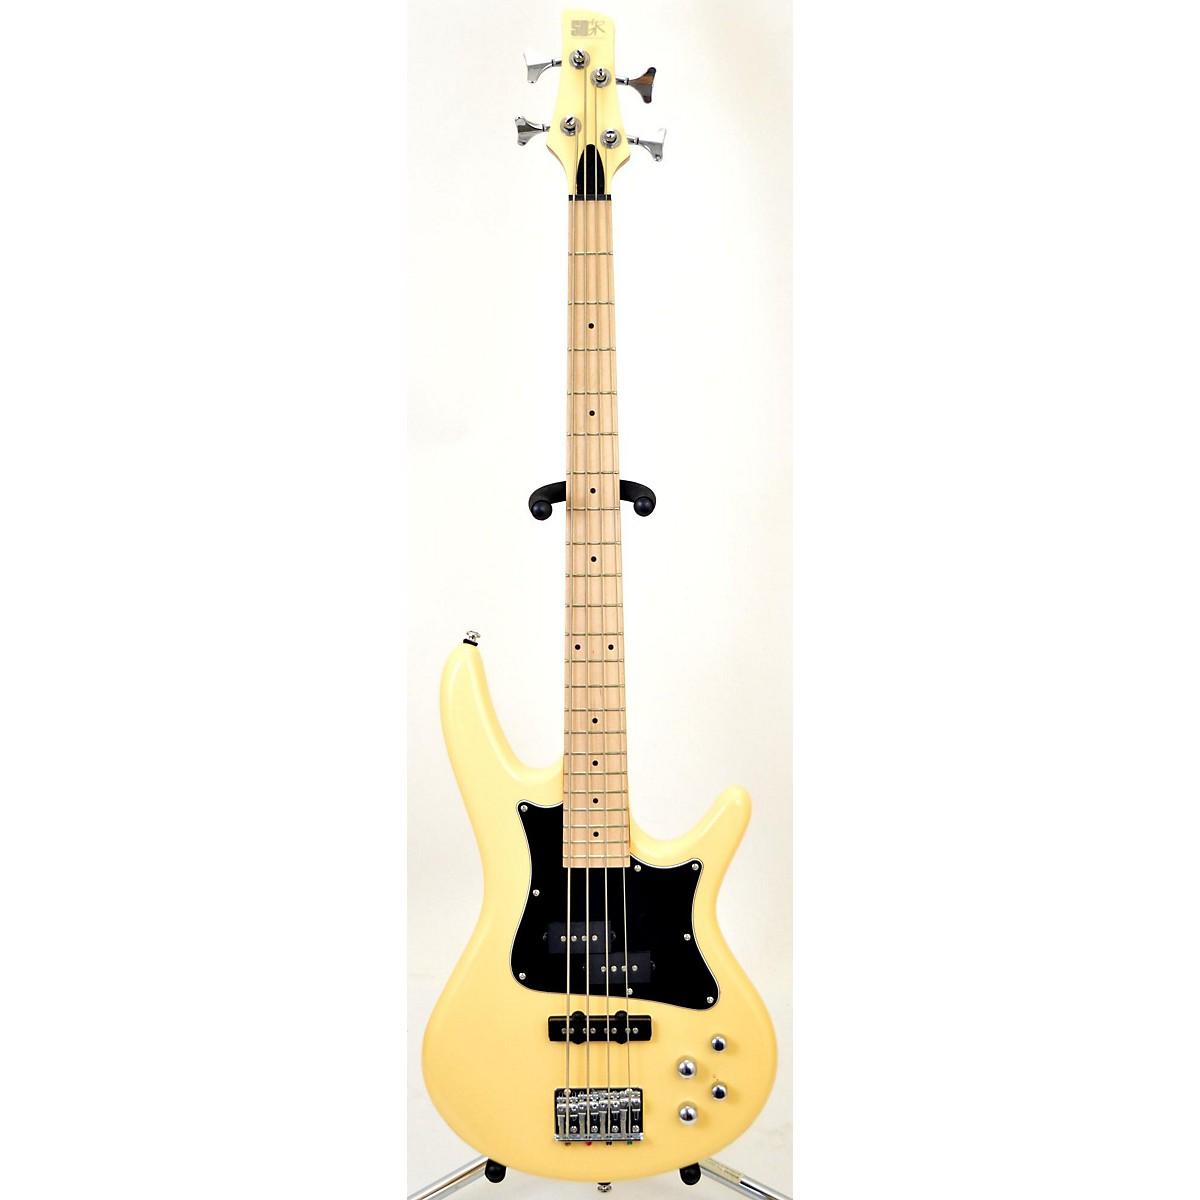 Ibanez SRMD200K Electric Bass Guitar